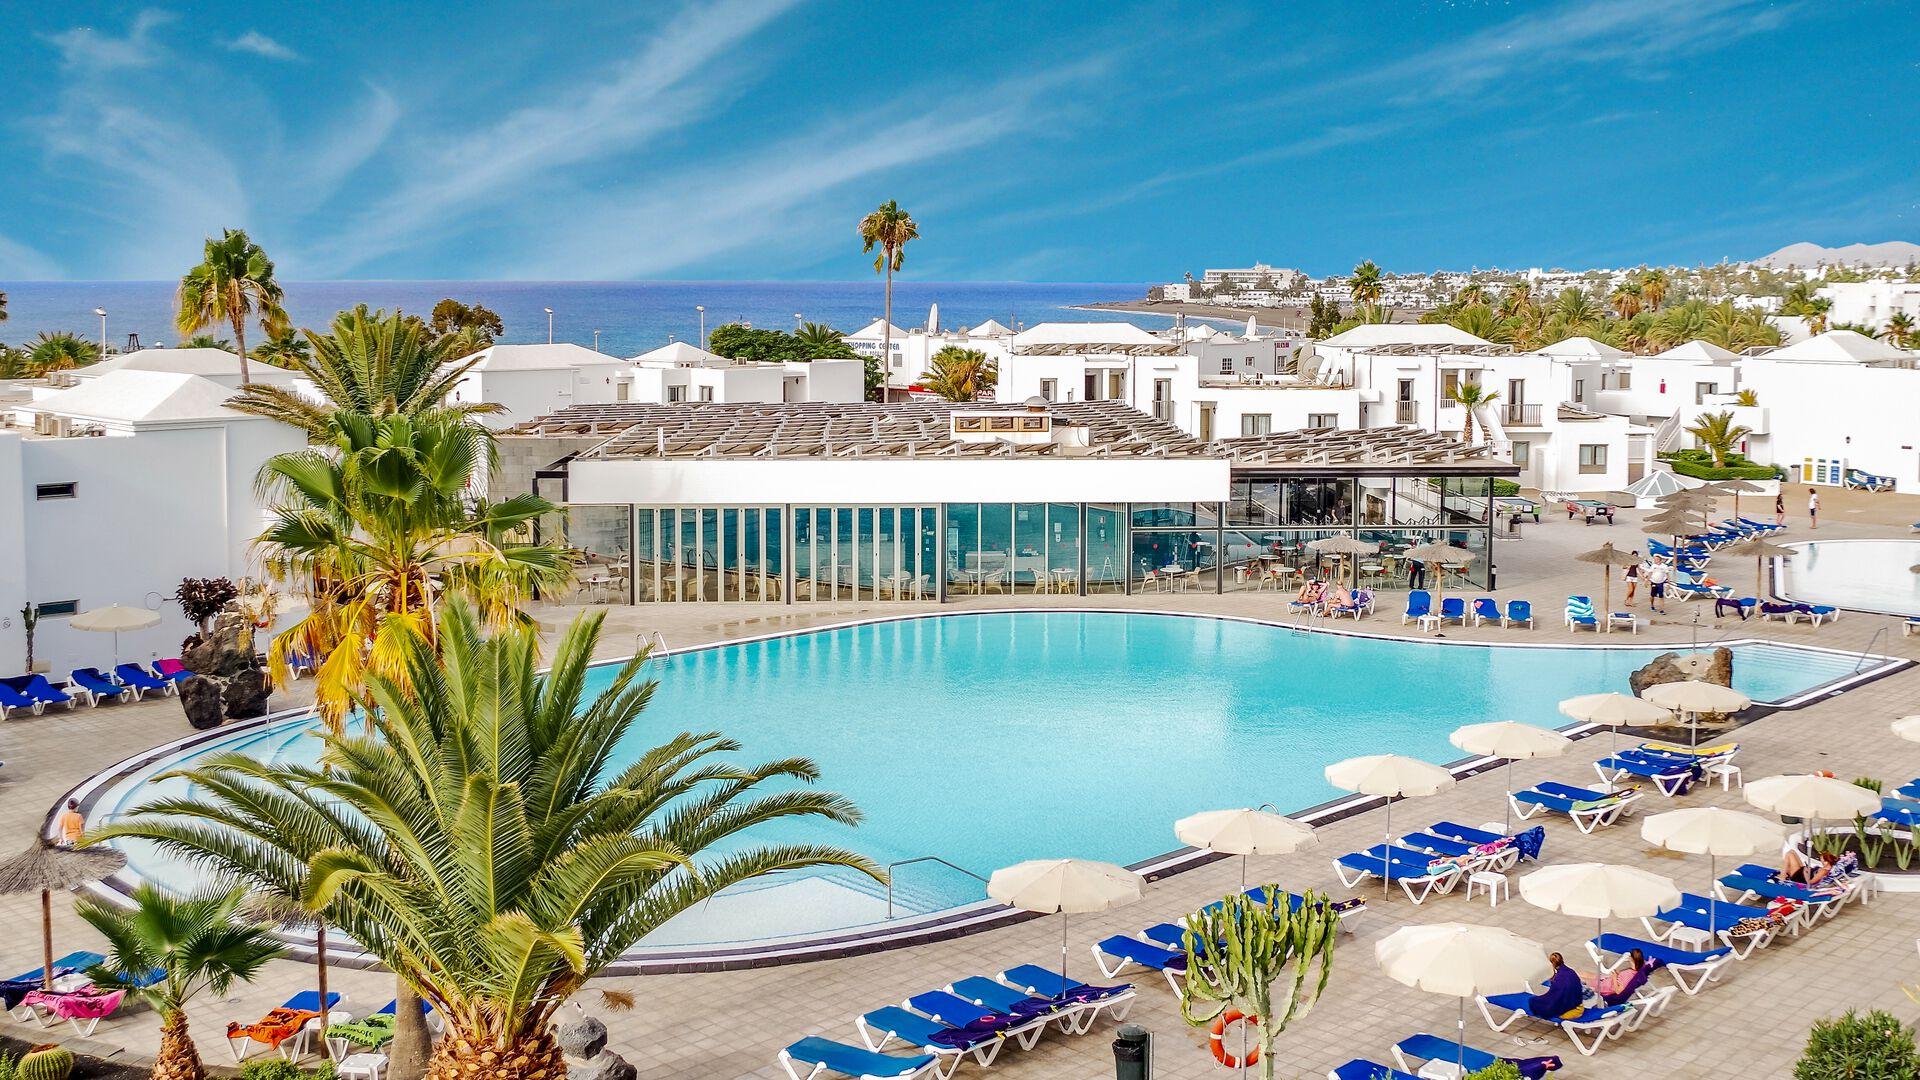 Séjour Lanzarote - Hotel Floresta - 3*